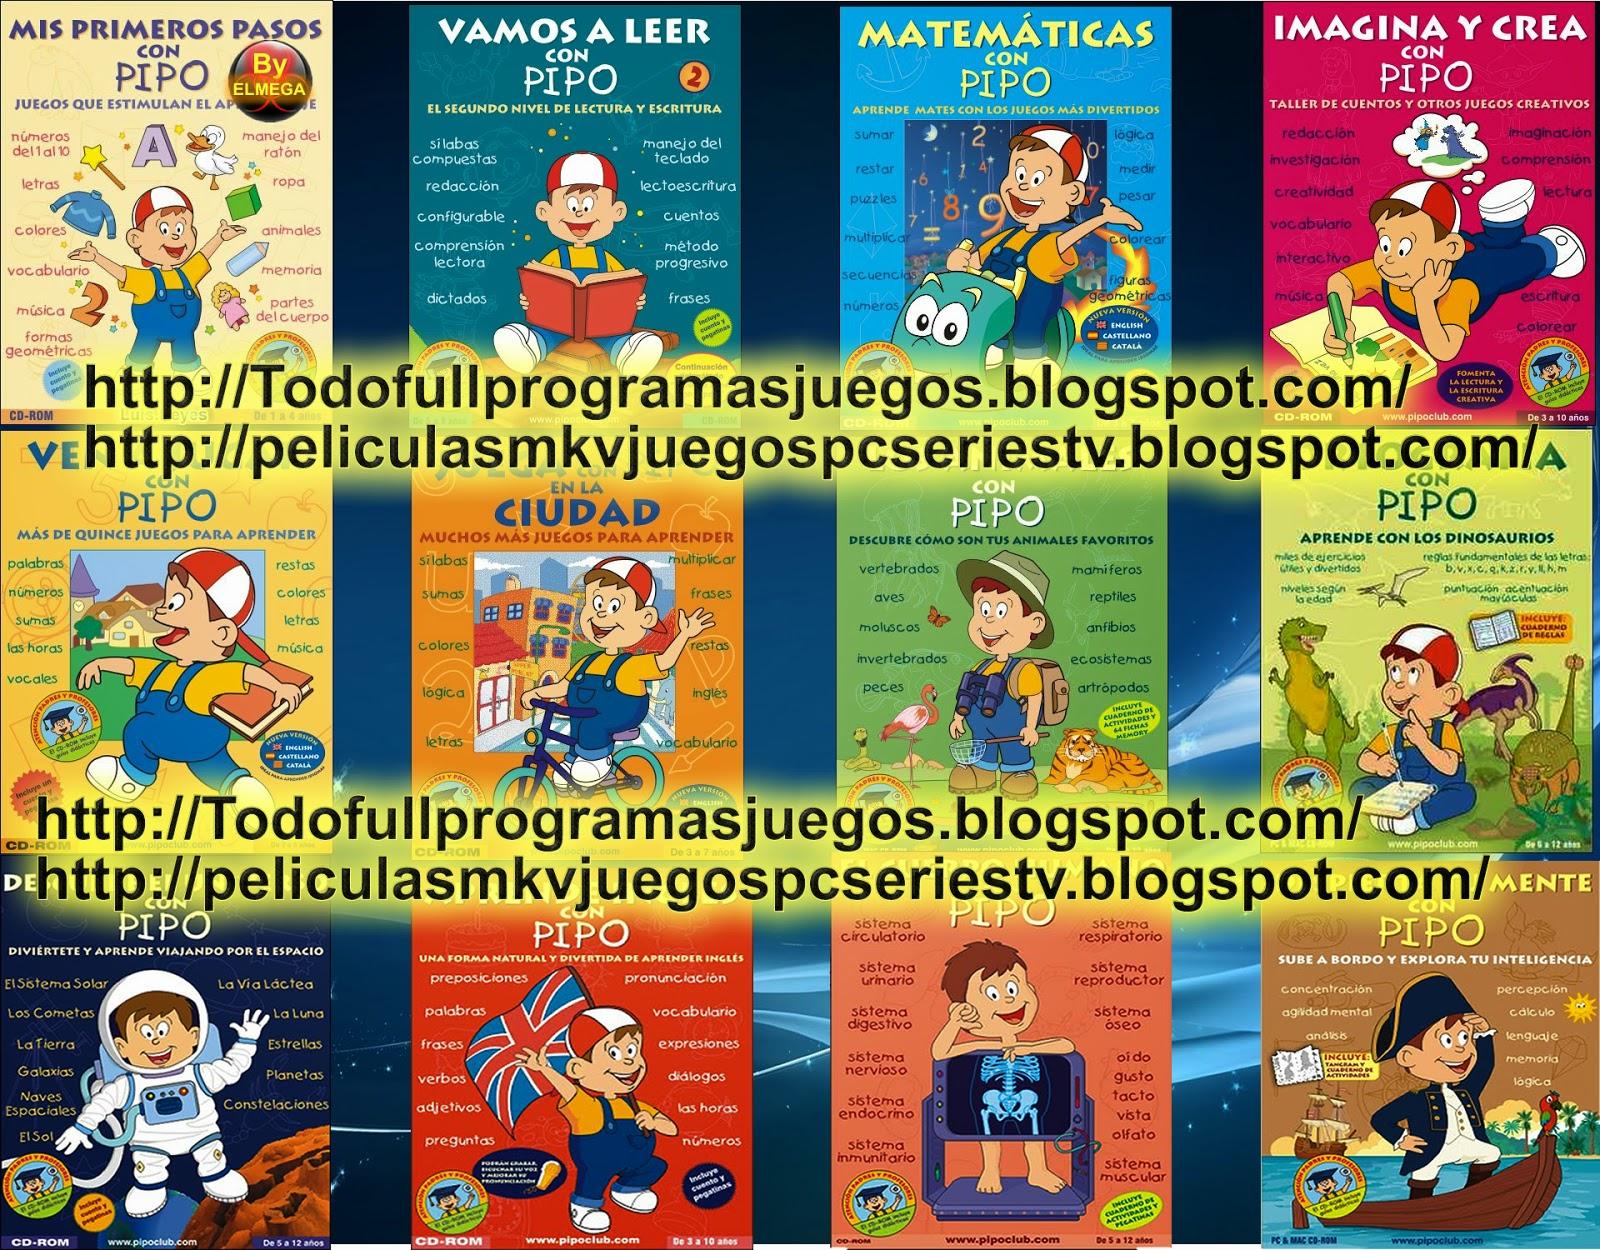 Peliculasmkv 17 Juegos De Aprendizaje De Pipo Full Español Iso Mega 4shared